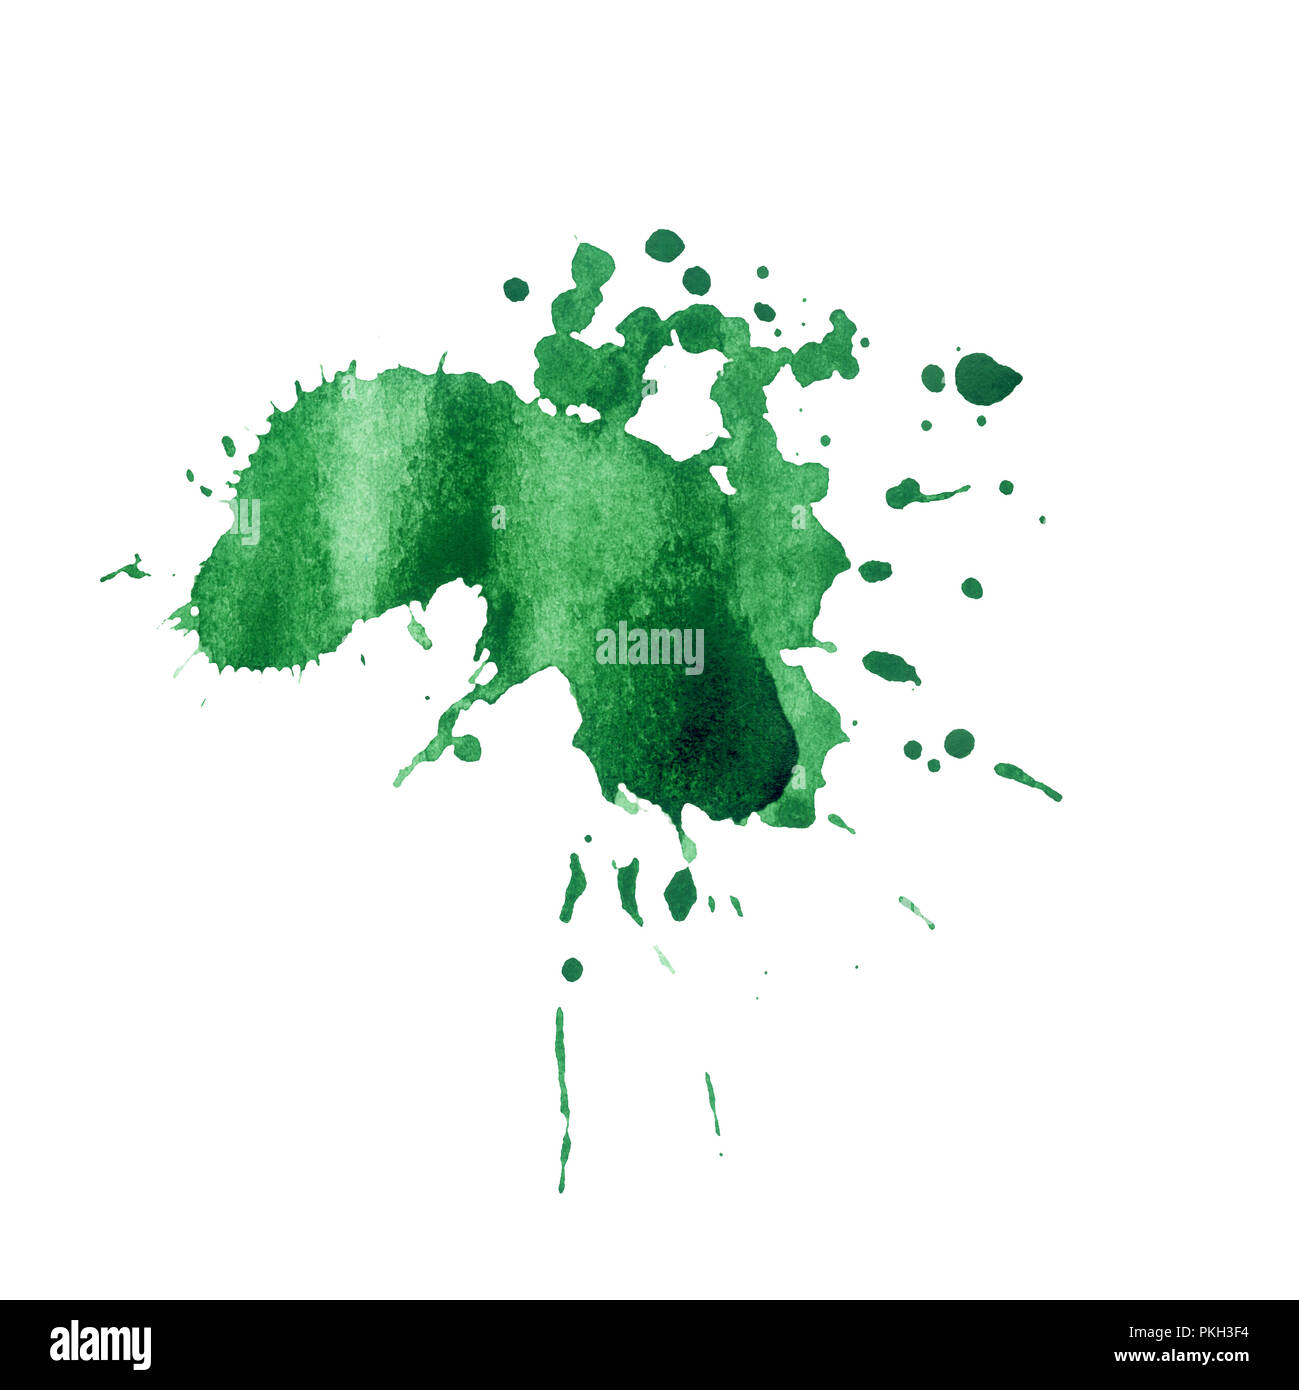 Acuarela textura salpicaduras de pintura verde. Inkblot Deak dibujados a mano en papel. Mancha seca verde sobre fondo blanco. Salpicaduras de tinta. Amorfo gota de pintura elemento de diseño. Aislados de raster blob de tinta Imagen De Stock